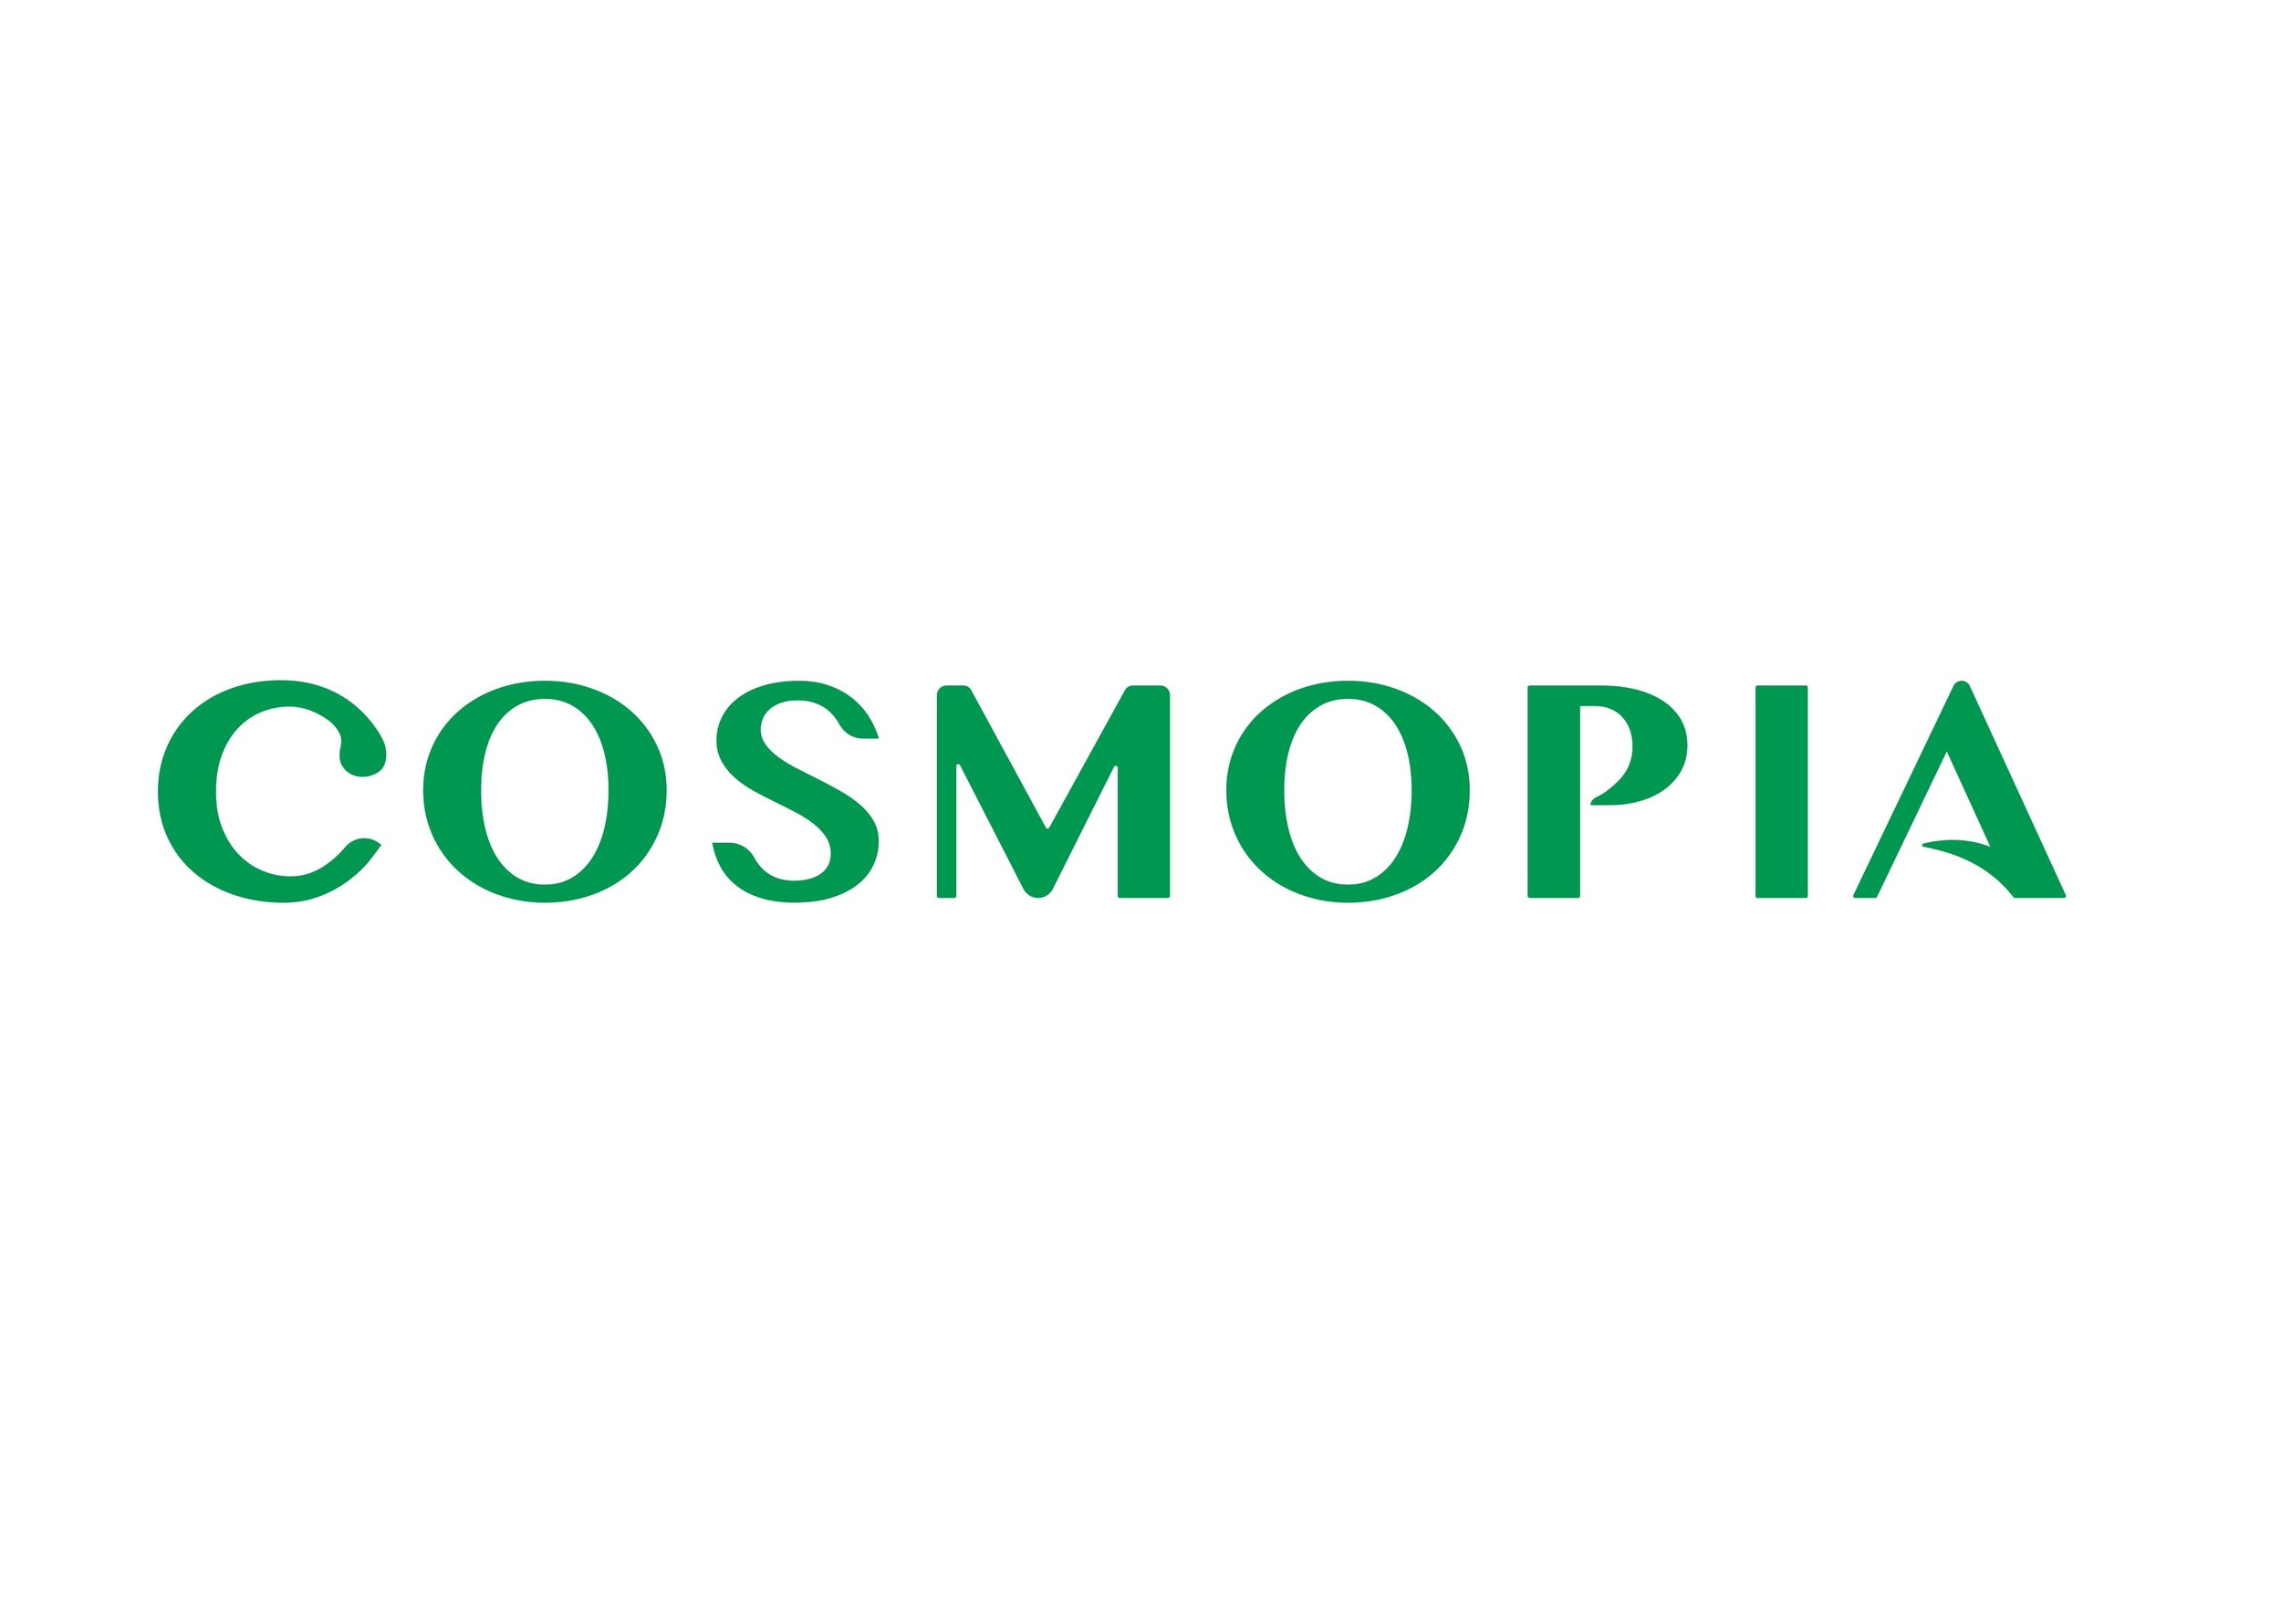 cosmopia_logo.jpg